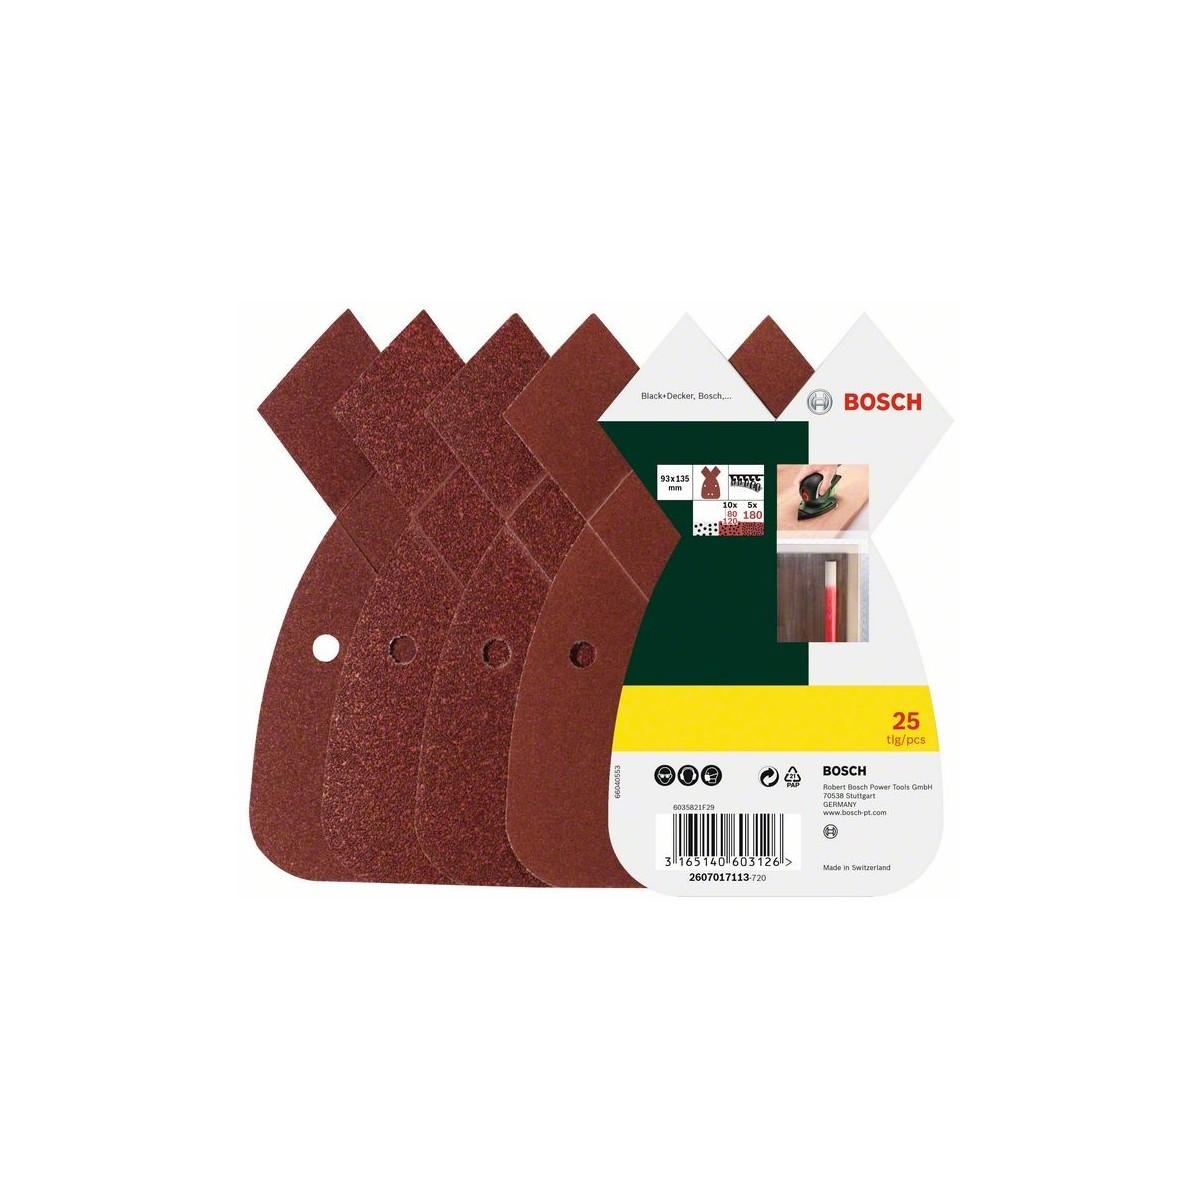 BOSCH Slīppapīrs B&D Mouse, 25gab. K80/120/180, 4 caurumi B&D 2607017113